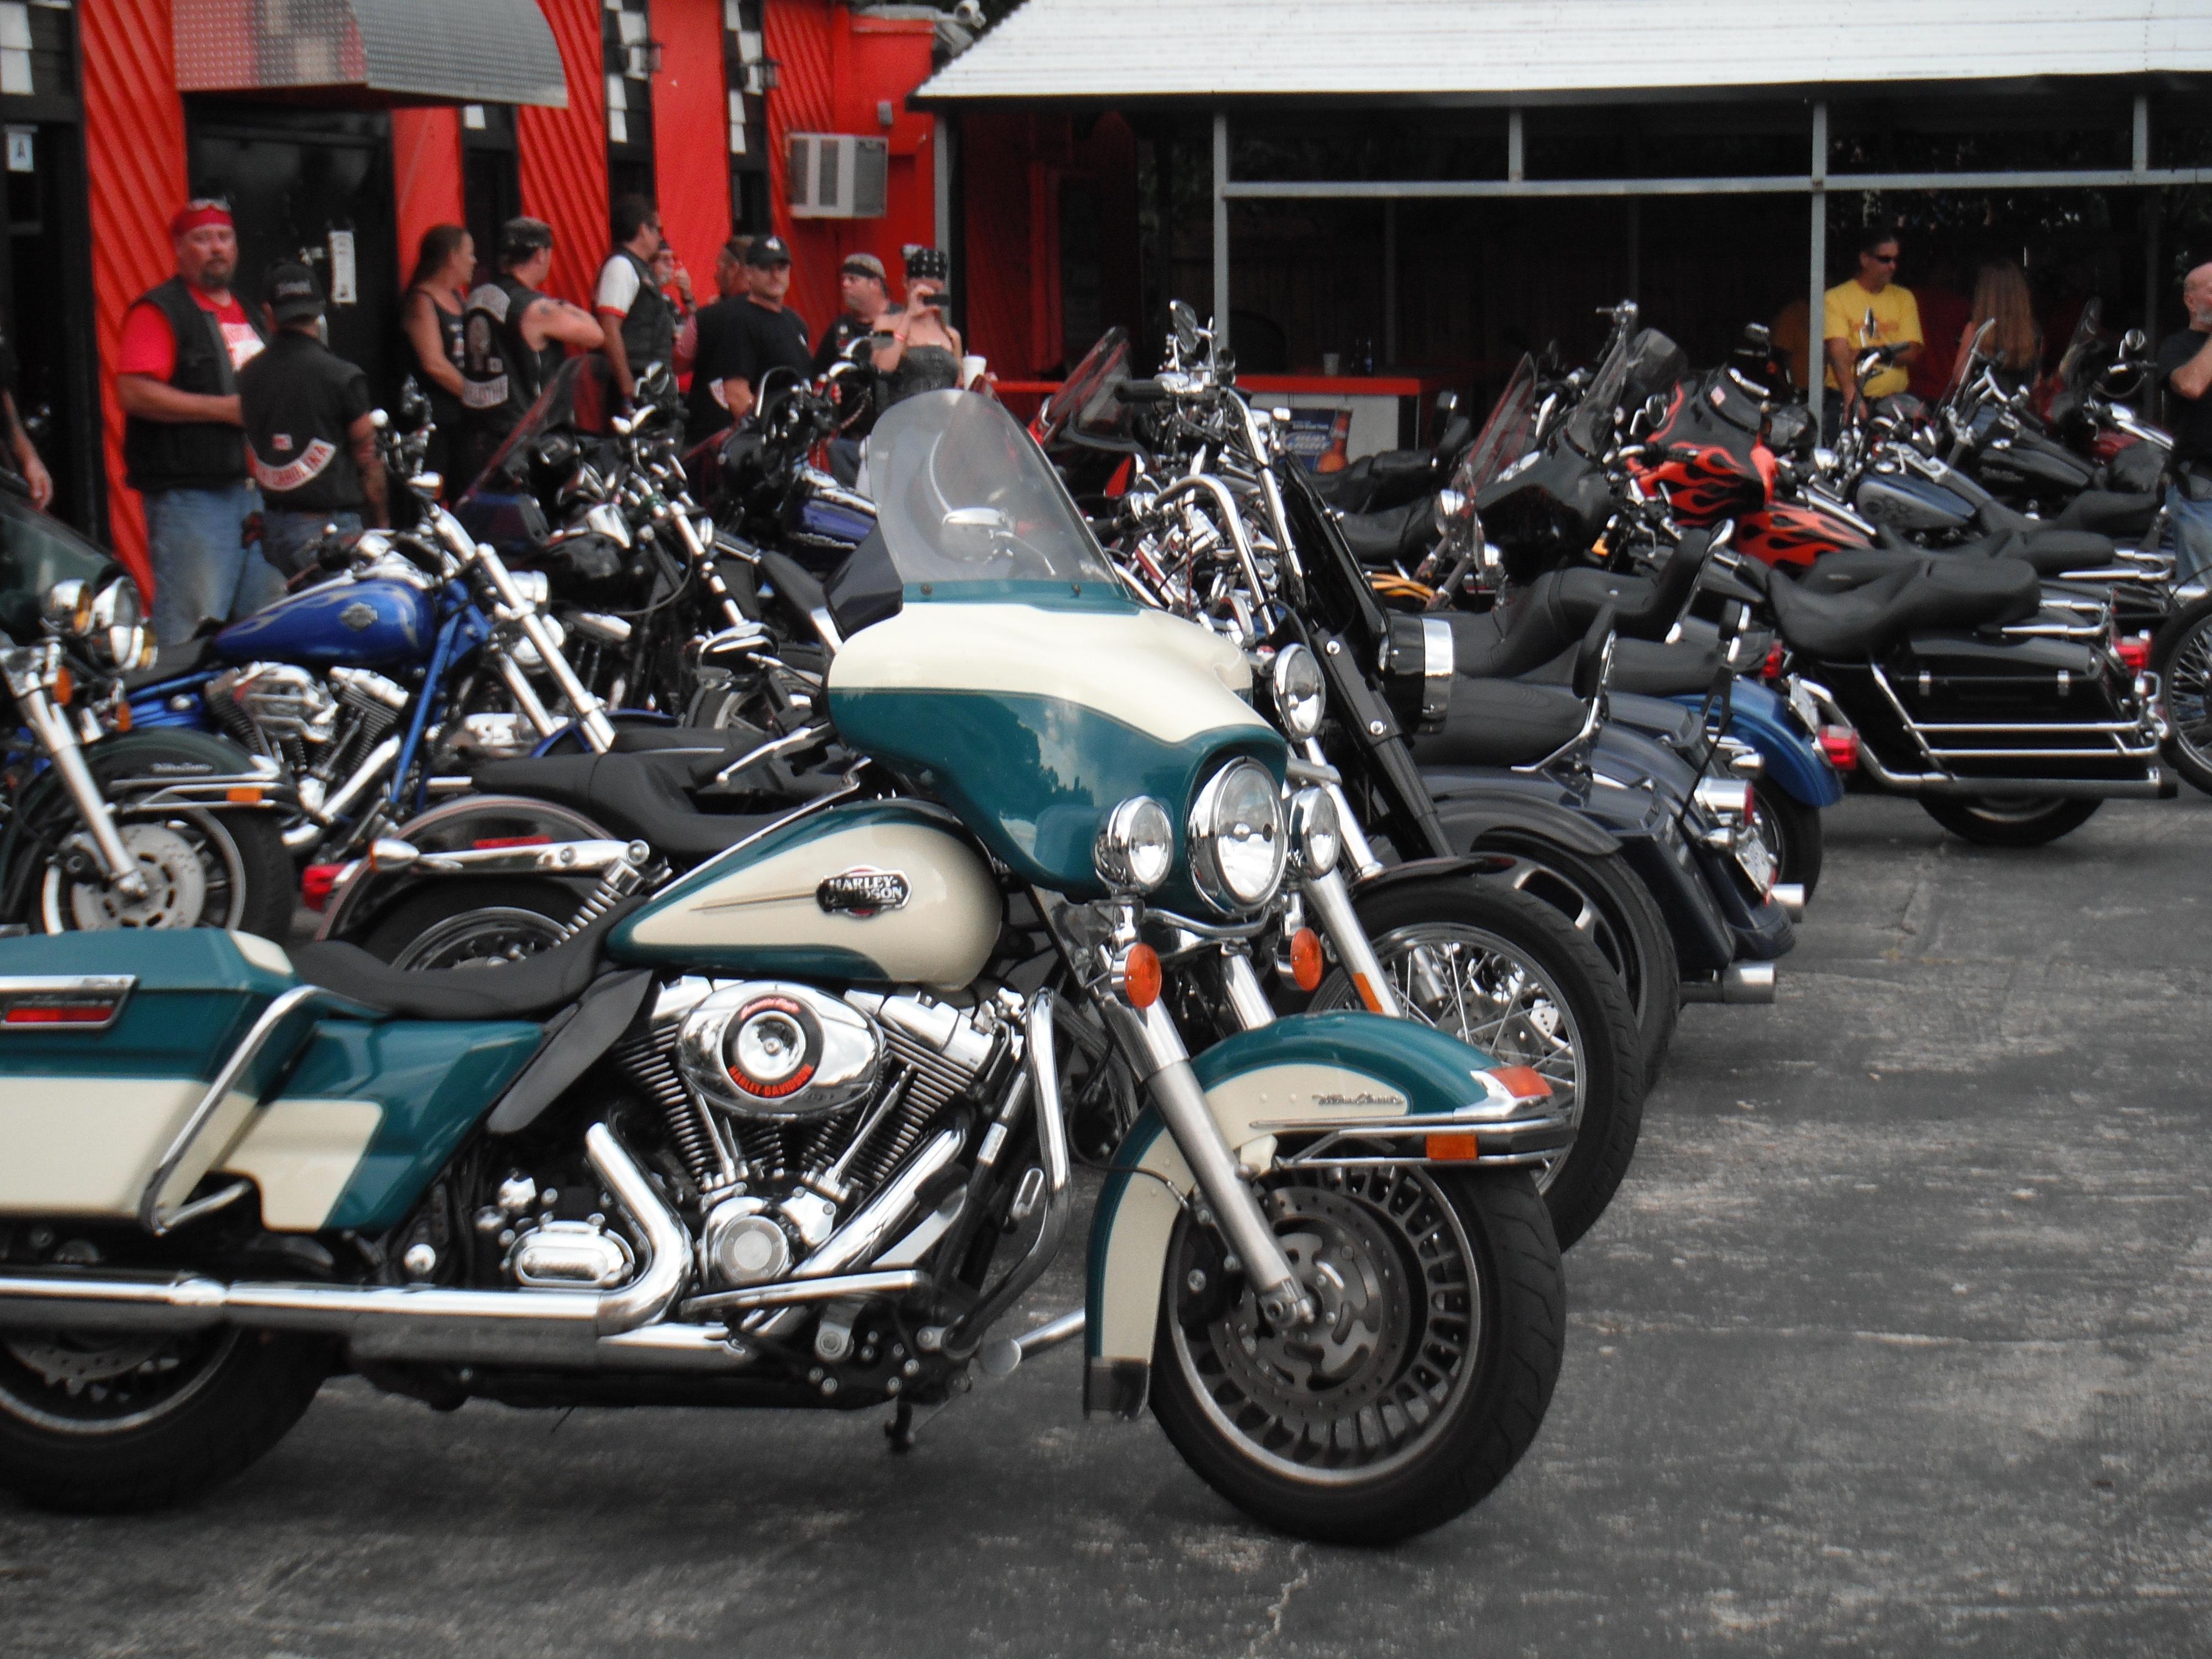 Ladson Biker Event | Uricchio Law Firm, SC Motorcycle Law, SC ...